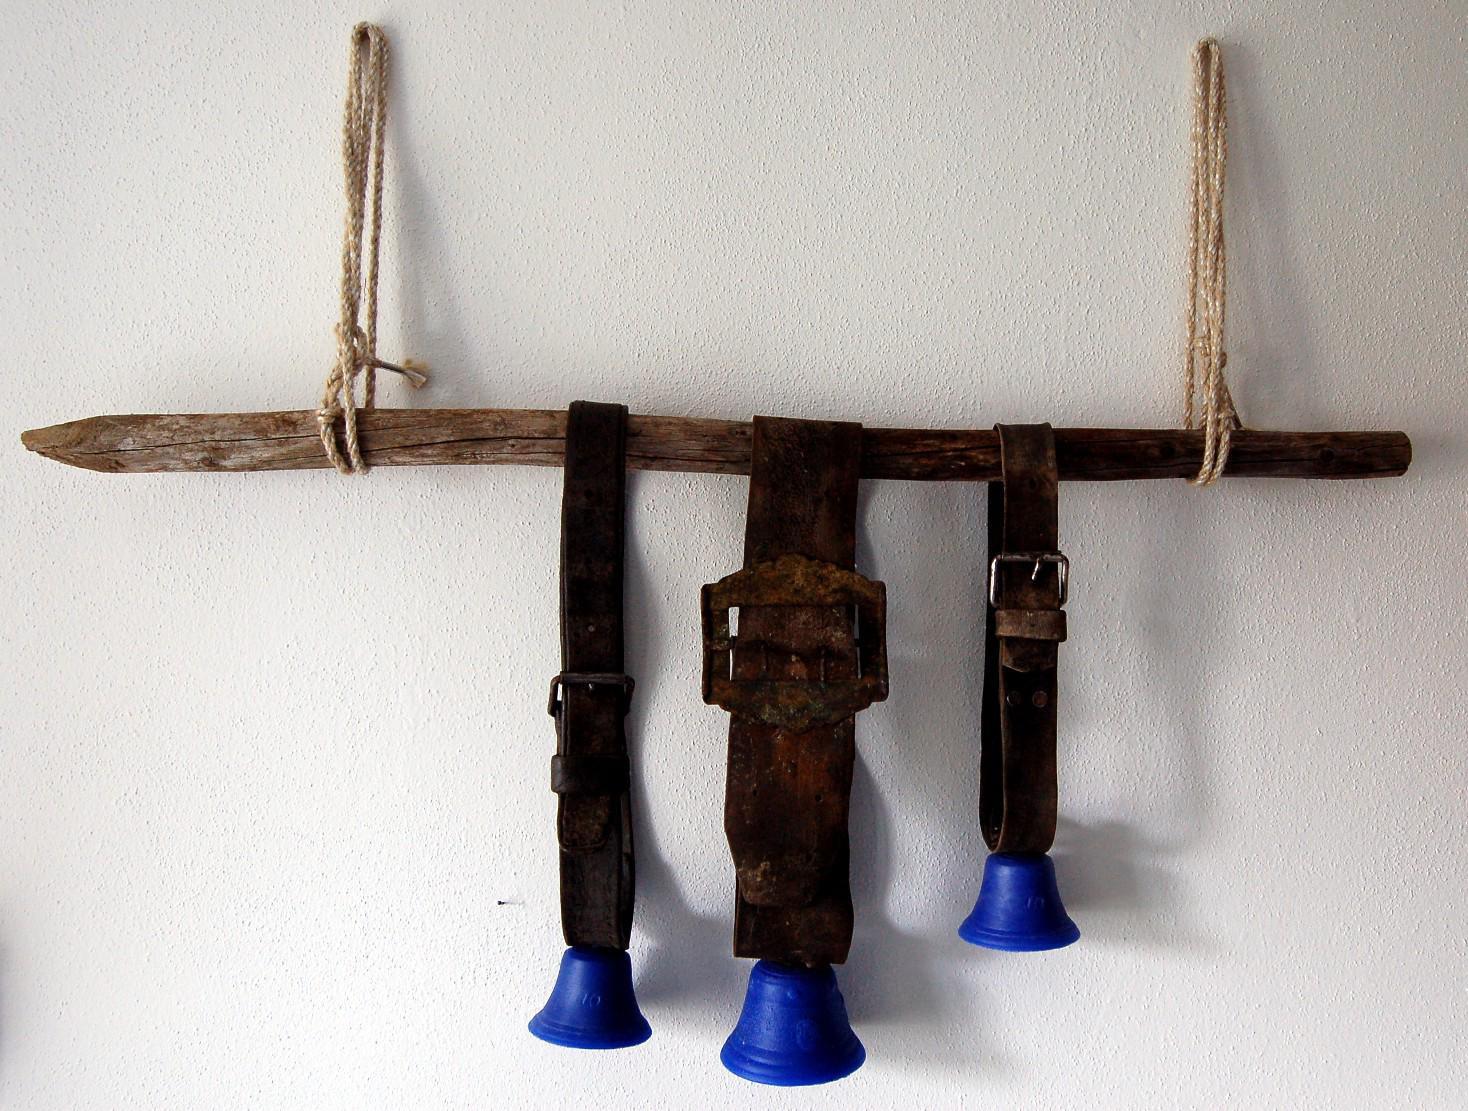 Bernd Henkel: Stumme Glocken, Leder, Silikon, Holz, 2010